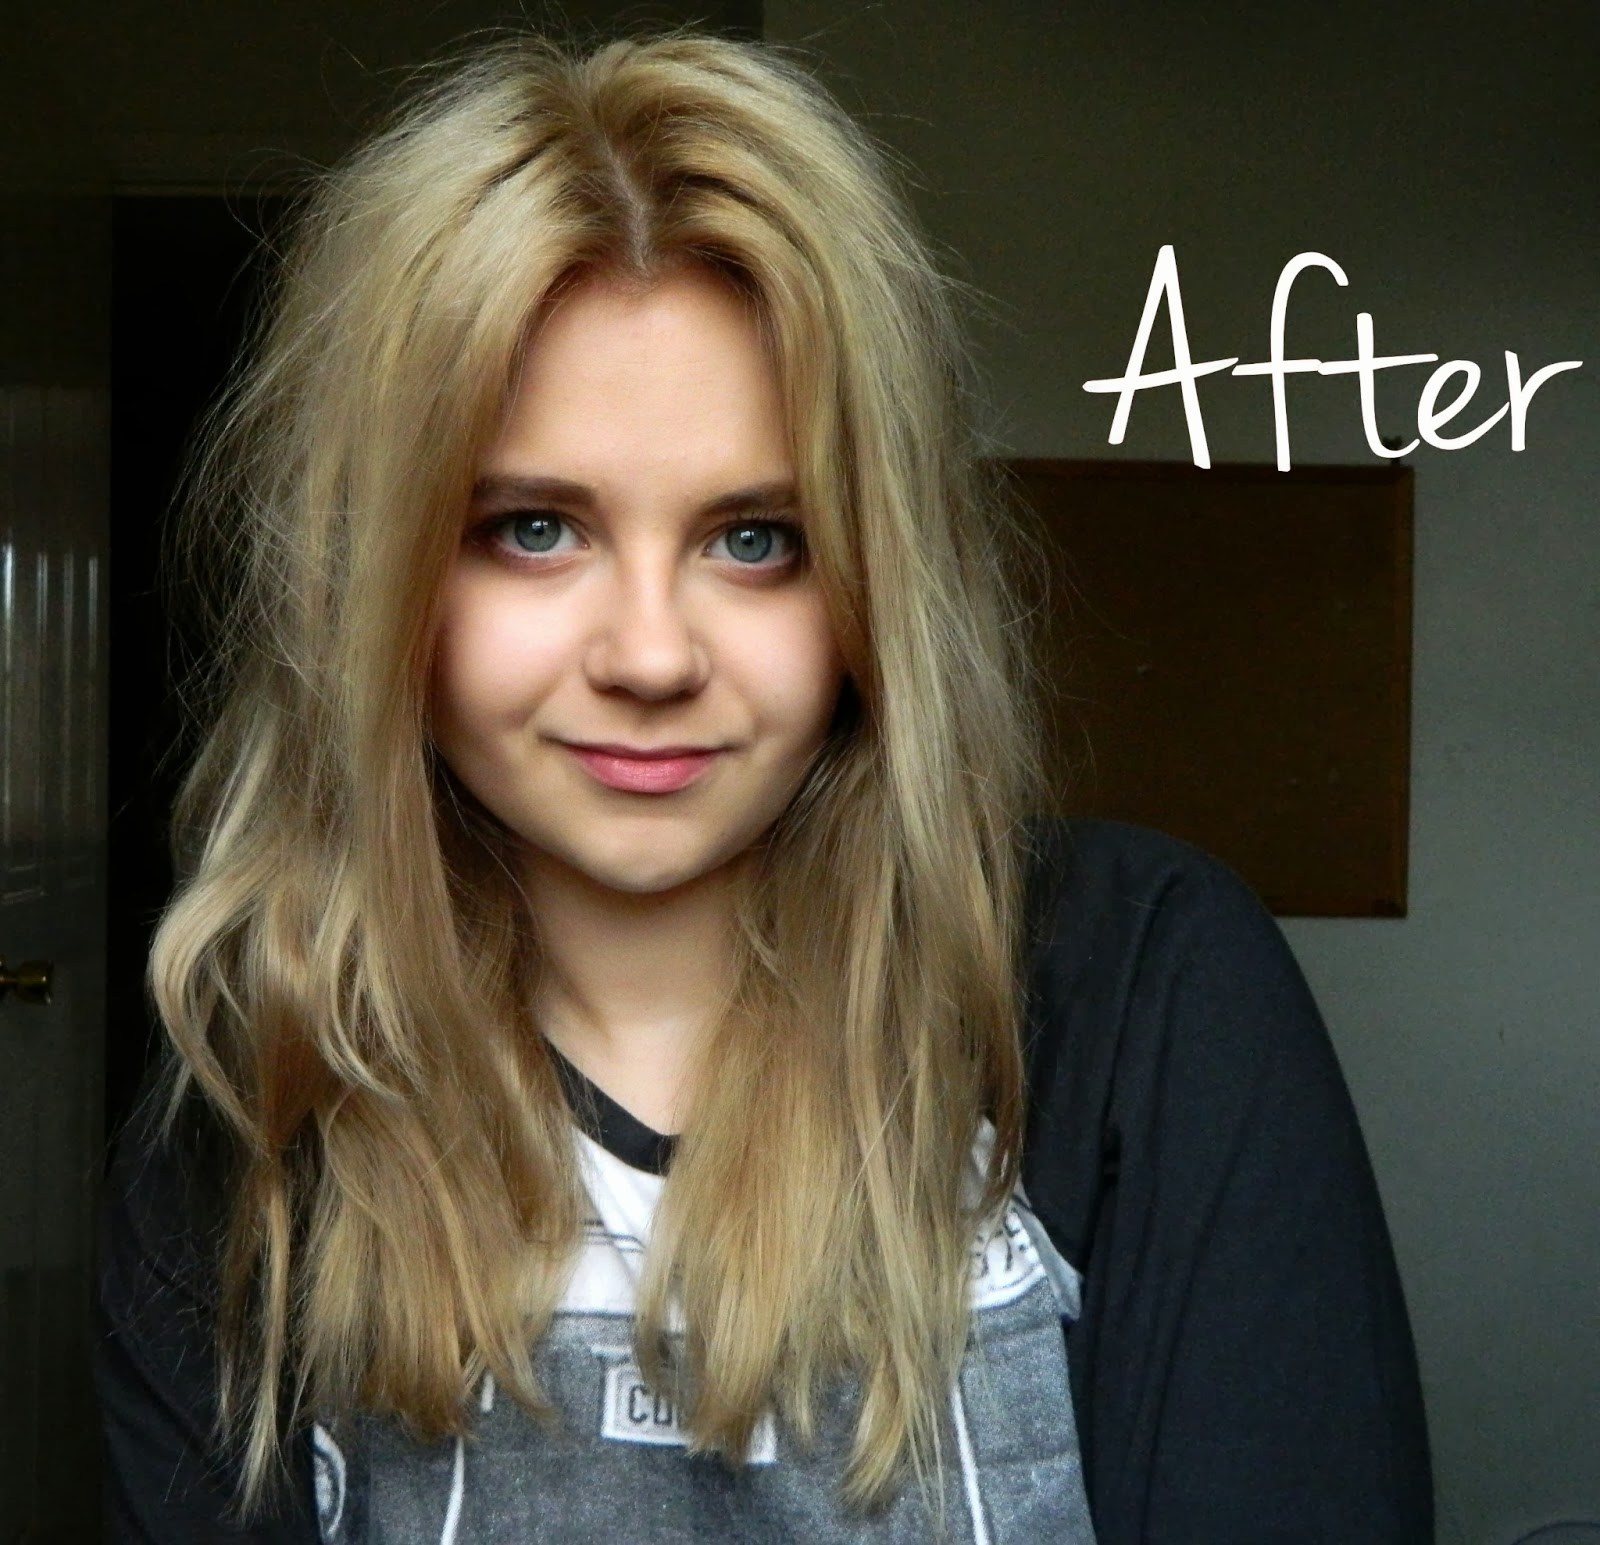 Pleasing Hair Dye For Blonde To Dark Brown Short Hair Fashions Short Hairstyles Gunalazisus